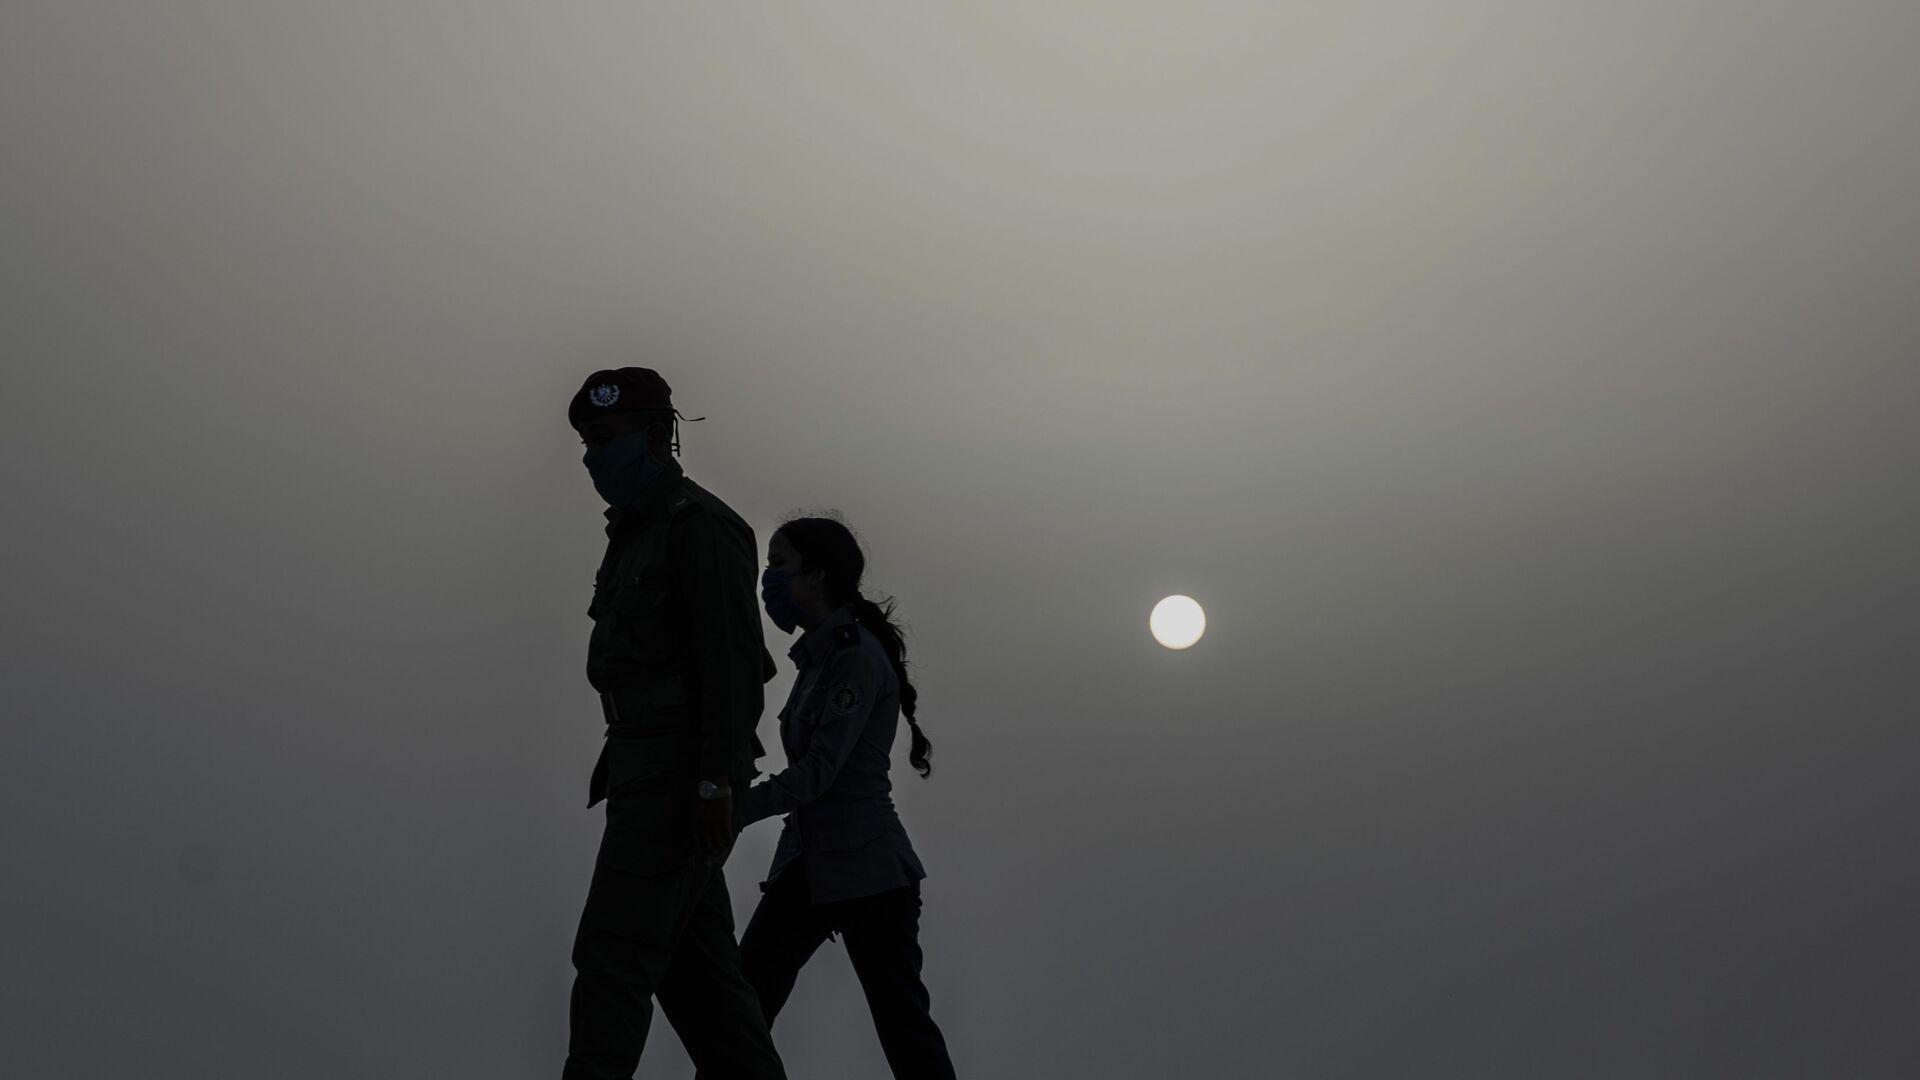 Nubes de polvo provenientes del Sahara en Cuba (archivo) - Sputnik Mundo, 1920, 04.10.2021